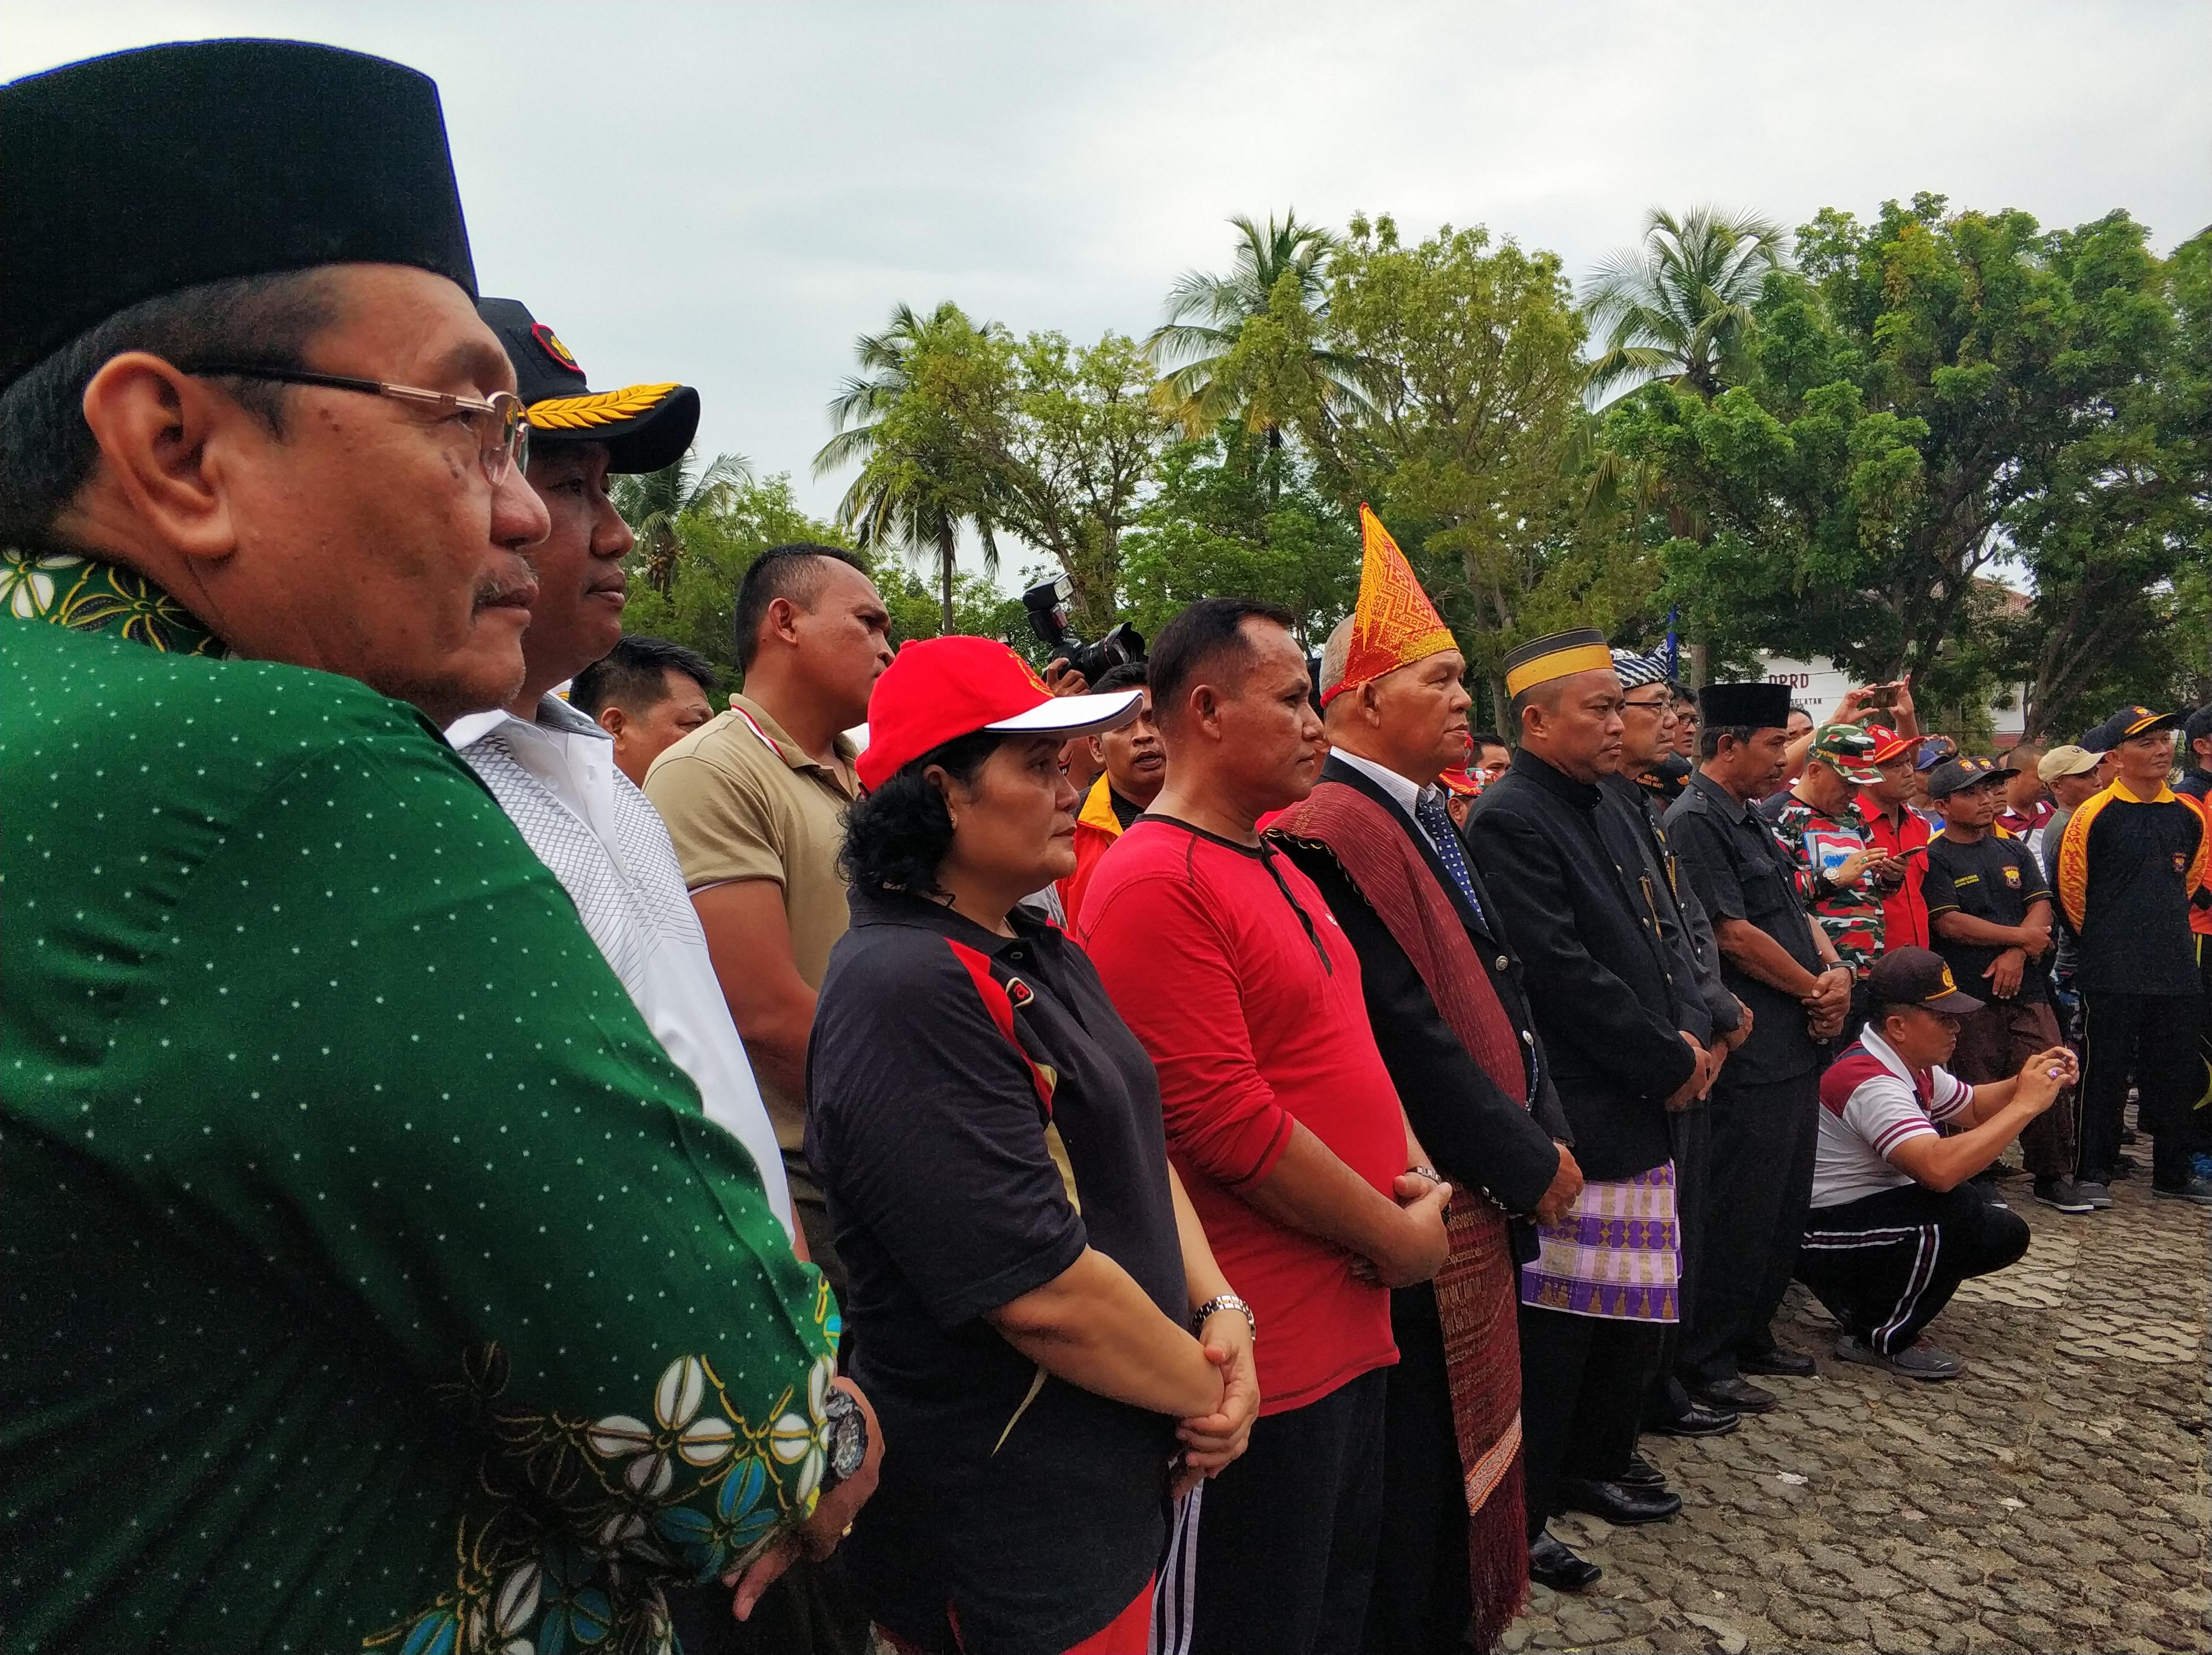 IMG_20180916_080335_1 Polres Lamsel Gelar Deklarasi Damai Bersama Pemkab Beserta Seluruh Elemen Parpol & Masyarakat